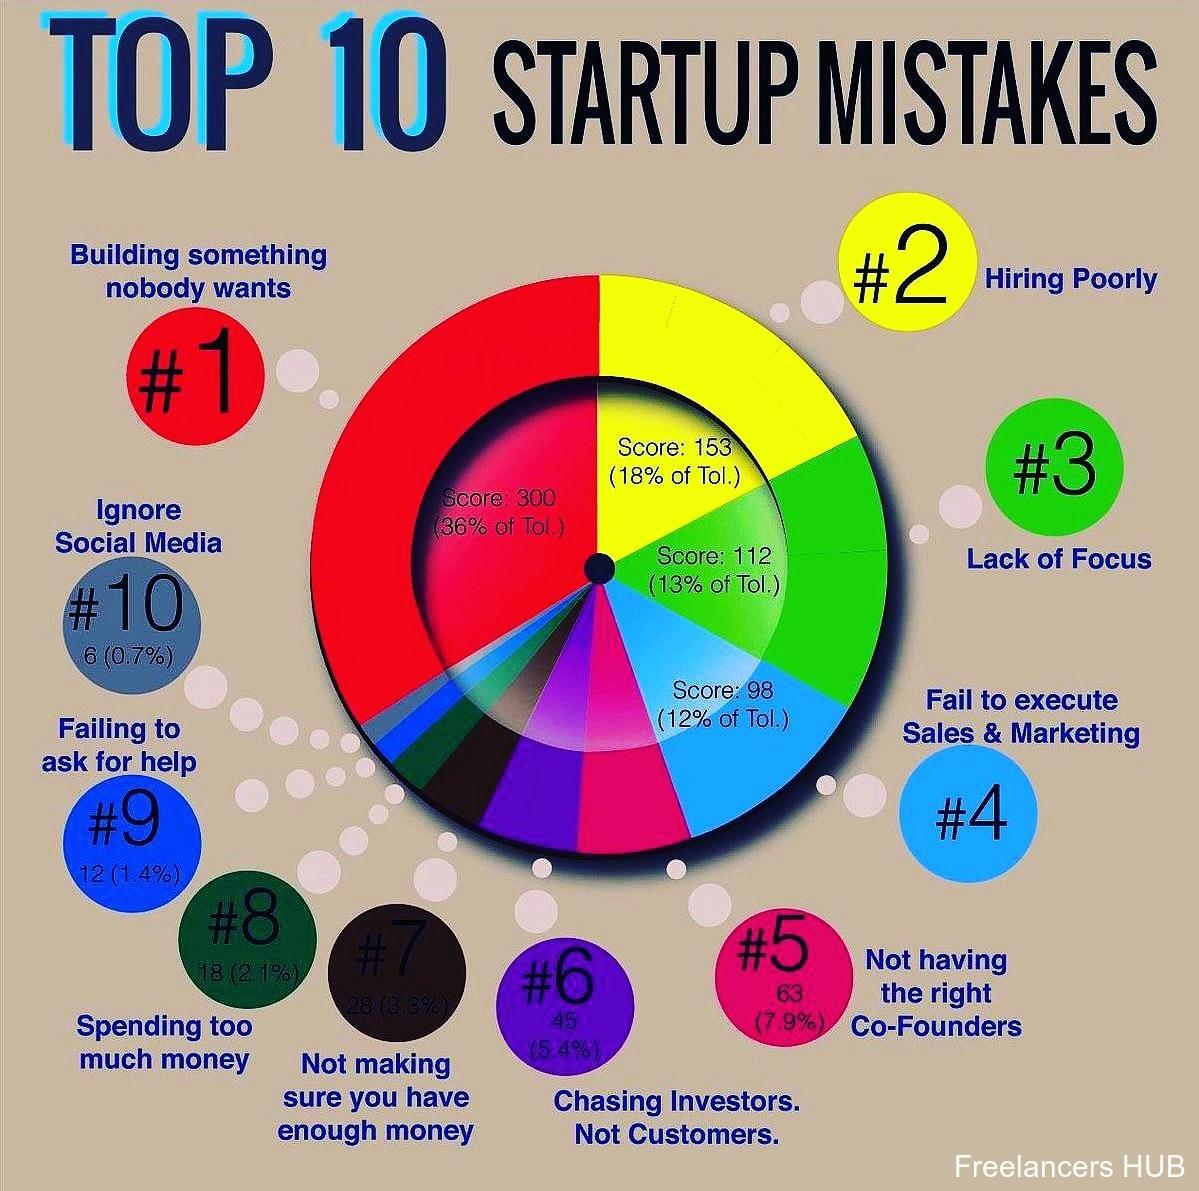 #startup #startups #entrepreneur #entreprenuership #growth #growthhacking #technology #tech #infographic #b2b #b2c #marketing #learning #company #hustle #hustlin #hustler #grind #technews